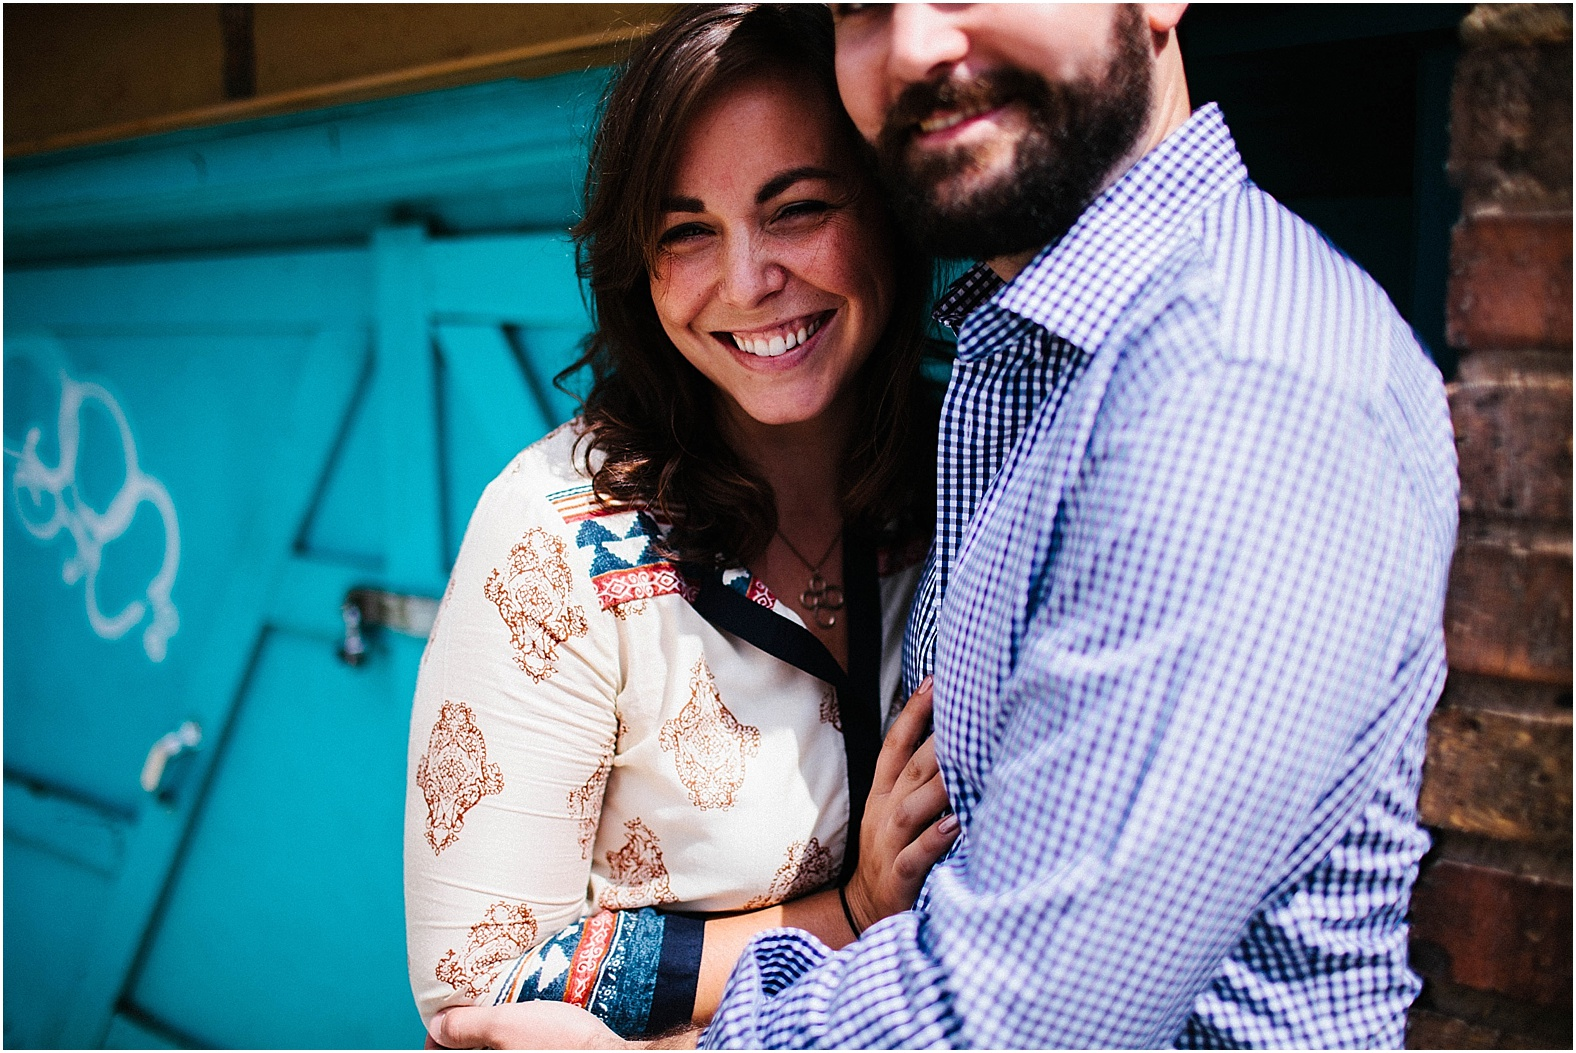 manzanita photo by rebecca caridad internation wedding photogrpaher, colorado wedding photographer, nashville wedding photographer_0449.jpg